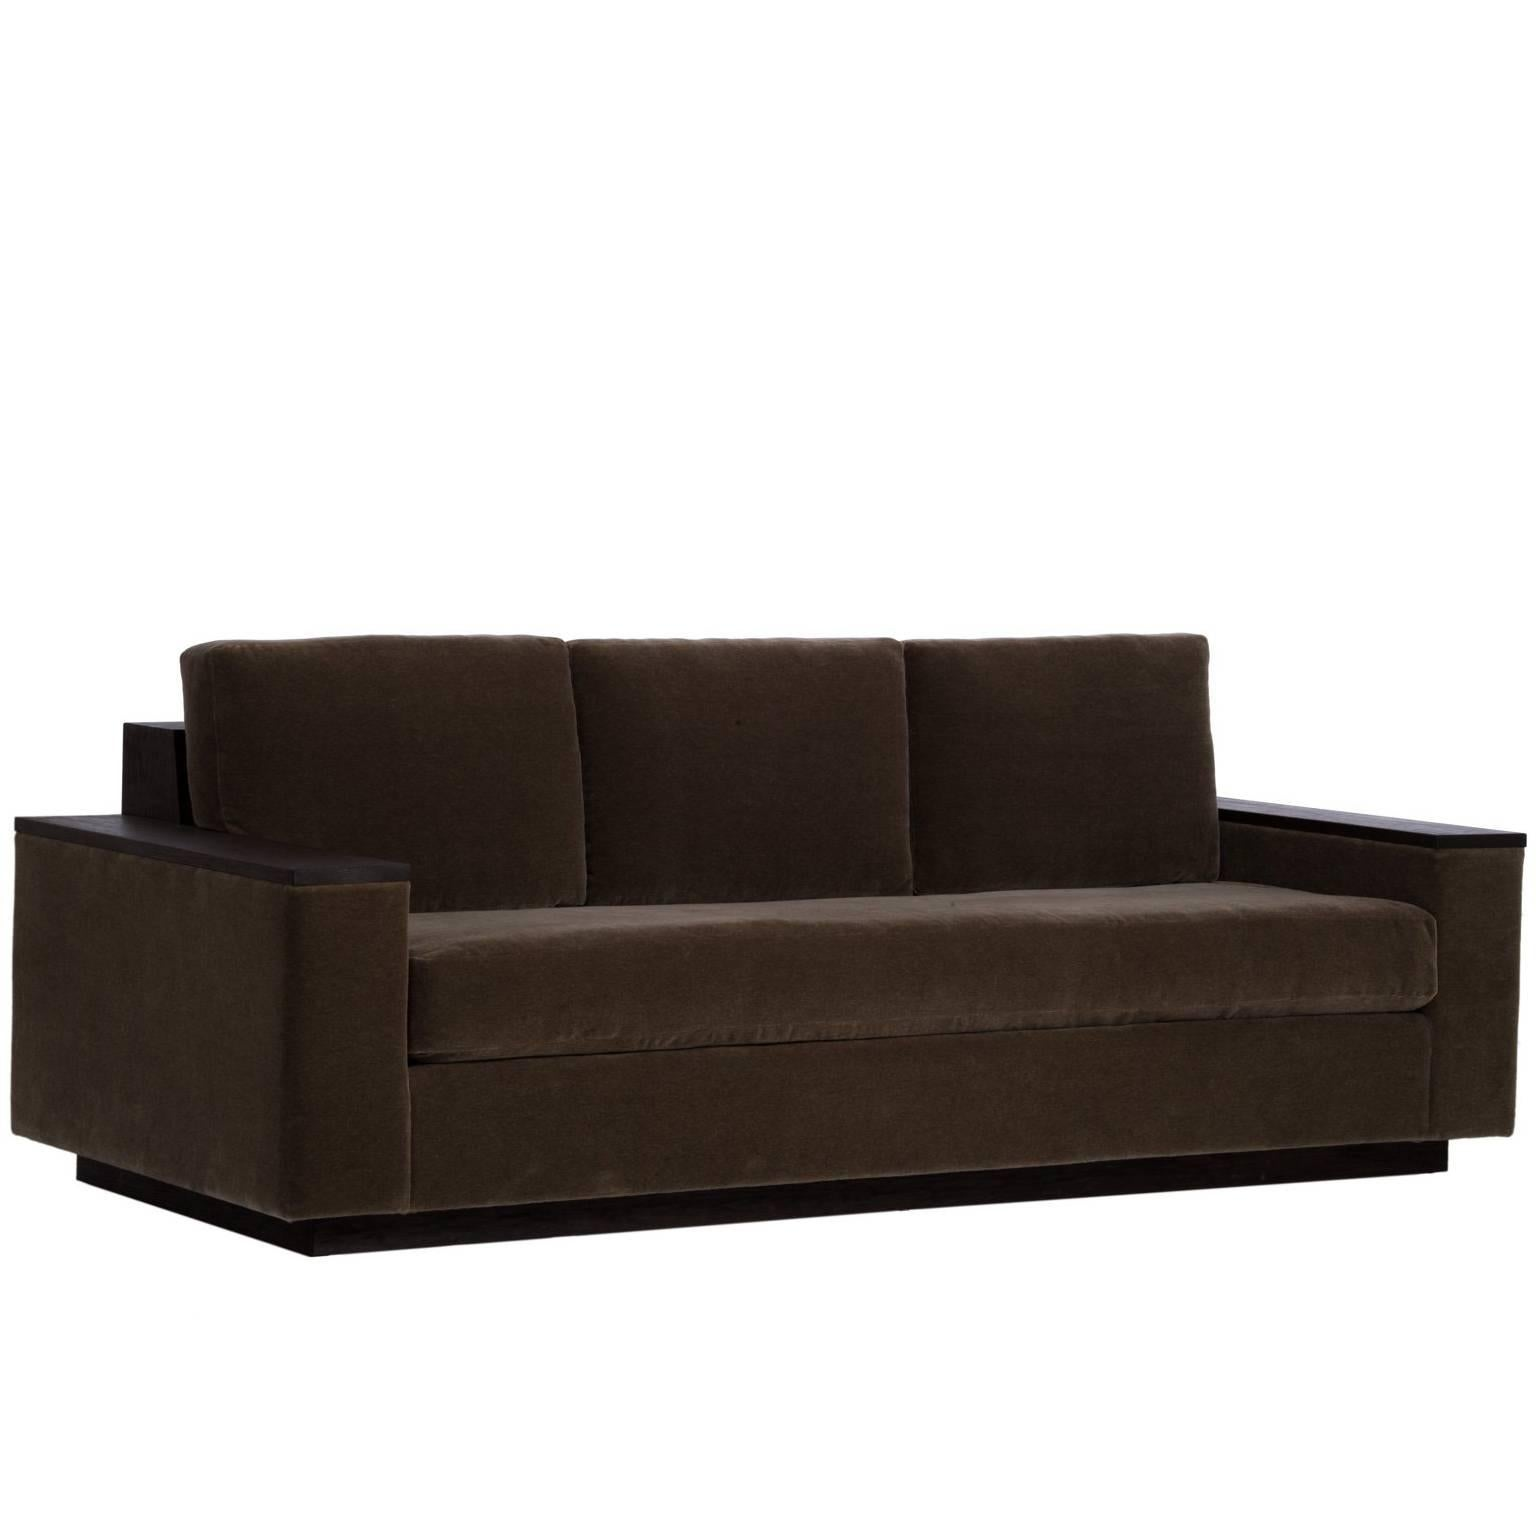 Marvelous Bolton Sofa In Mohair